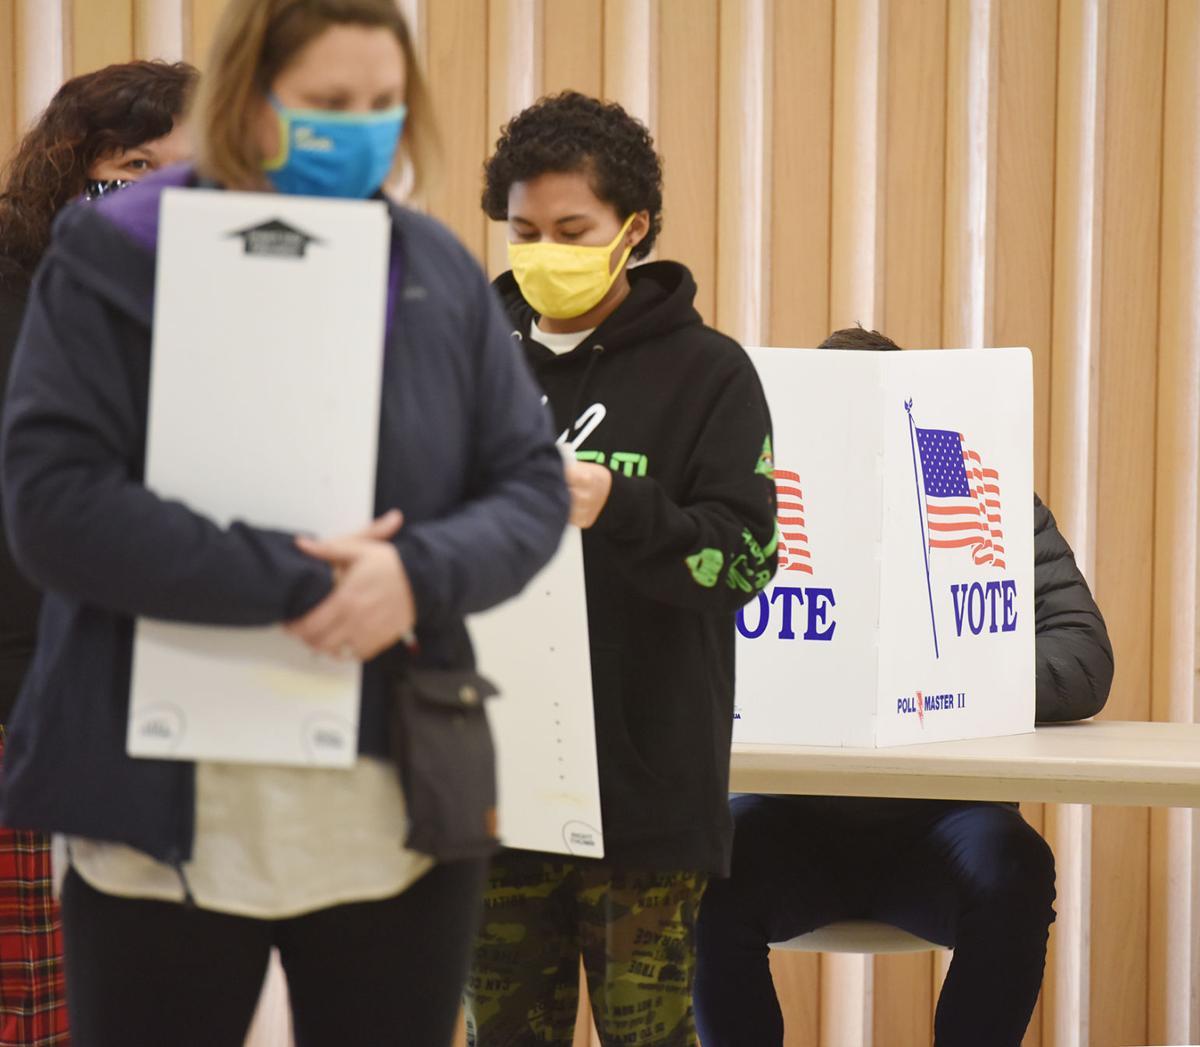 201104-HP-election-voting1-photo.jpg